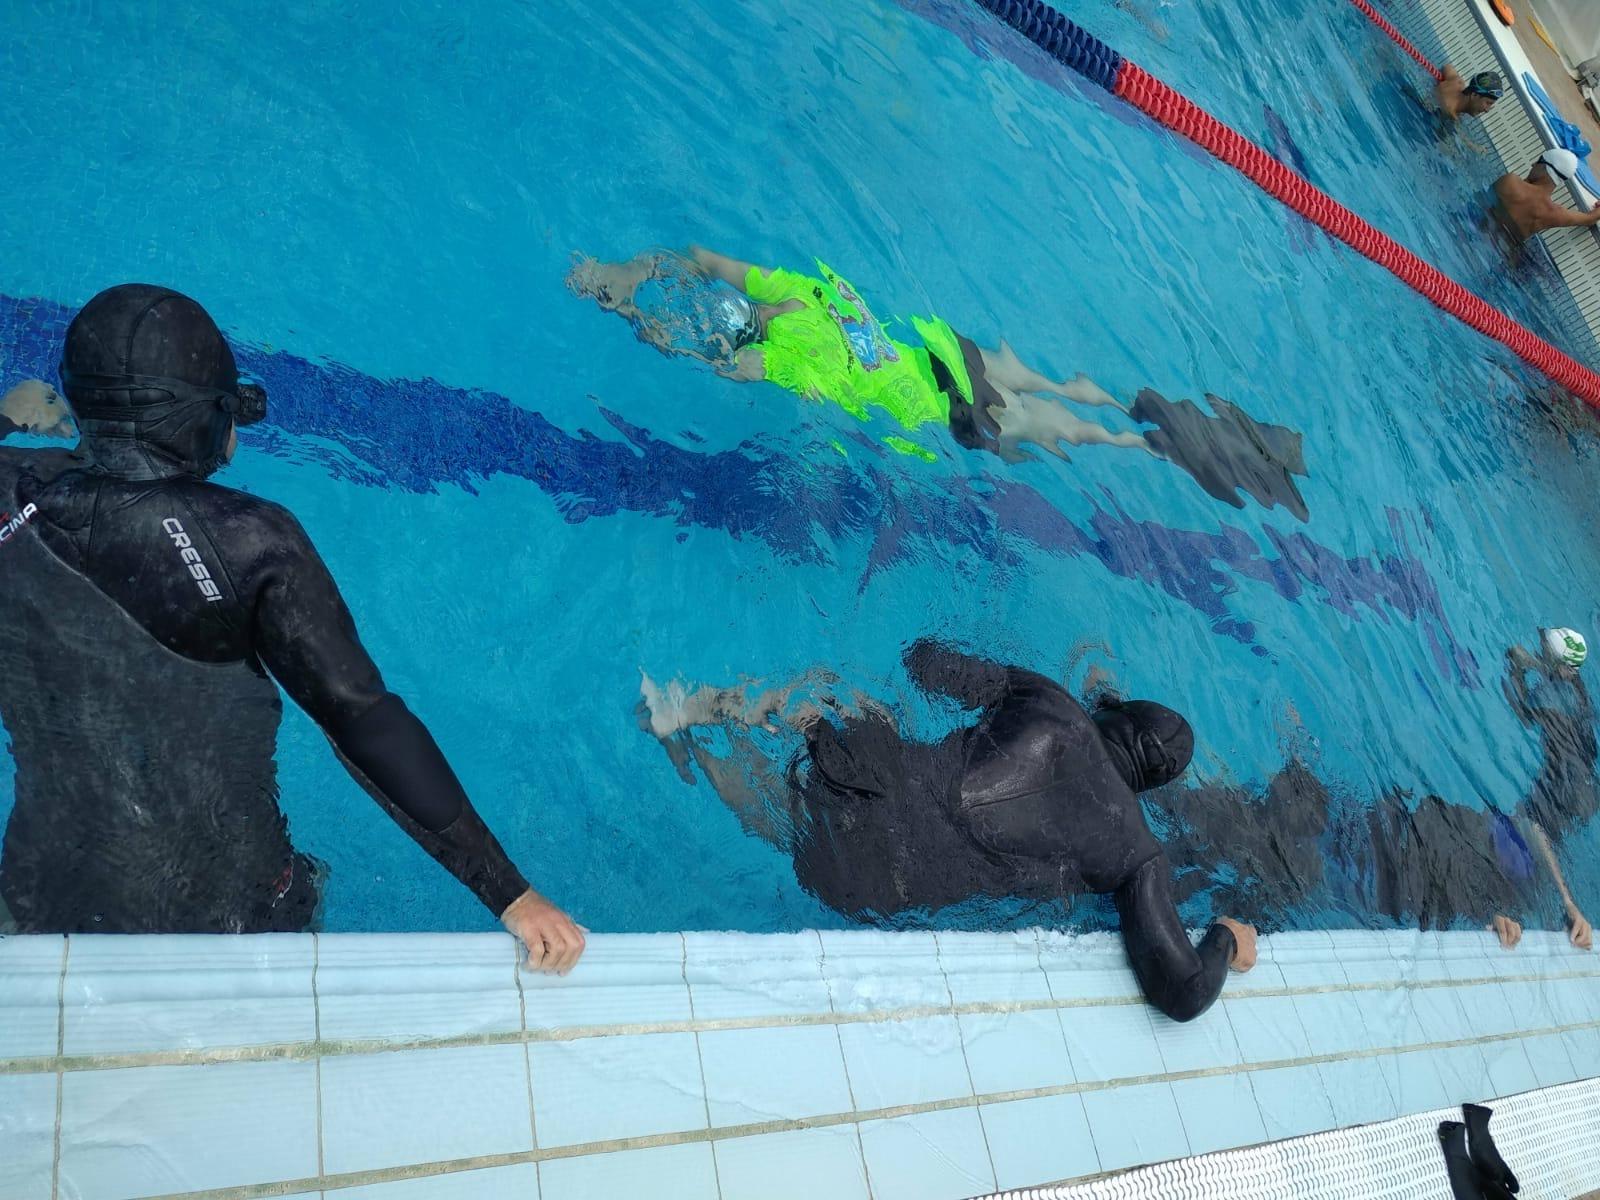 instructor de apnea enseña cómo hacer apnea dinámica